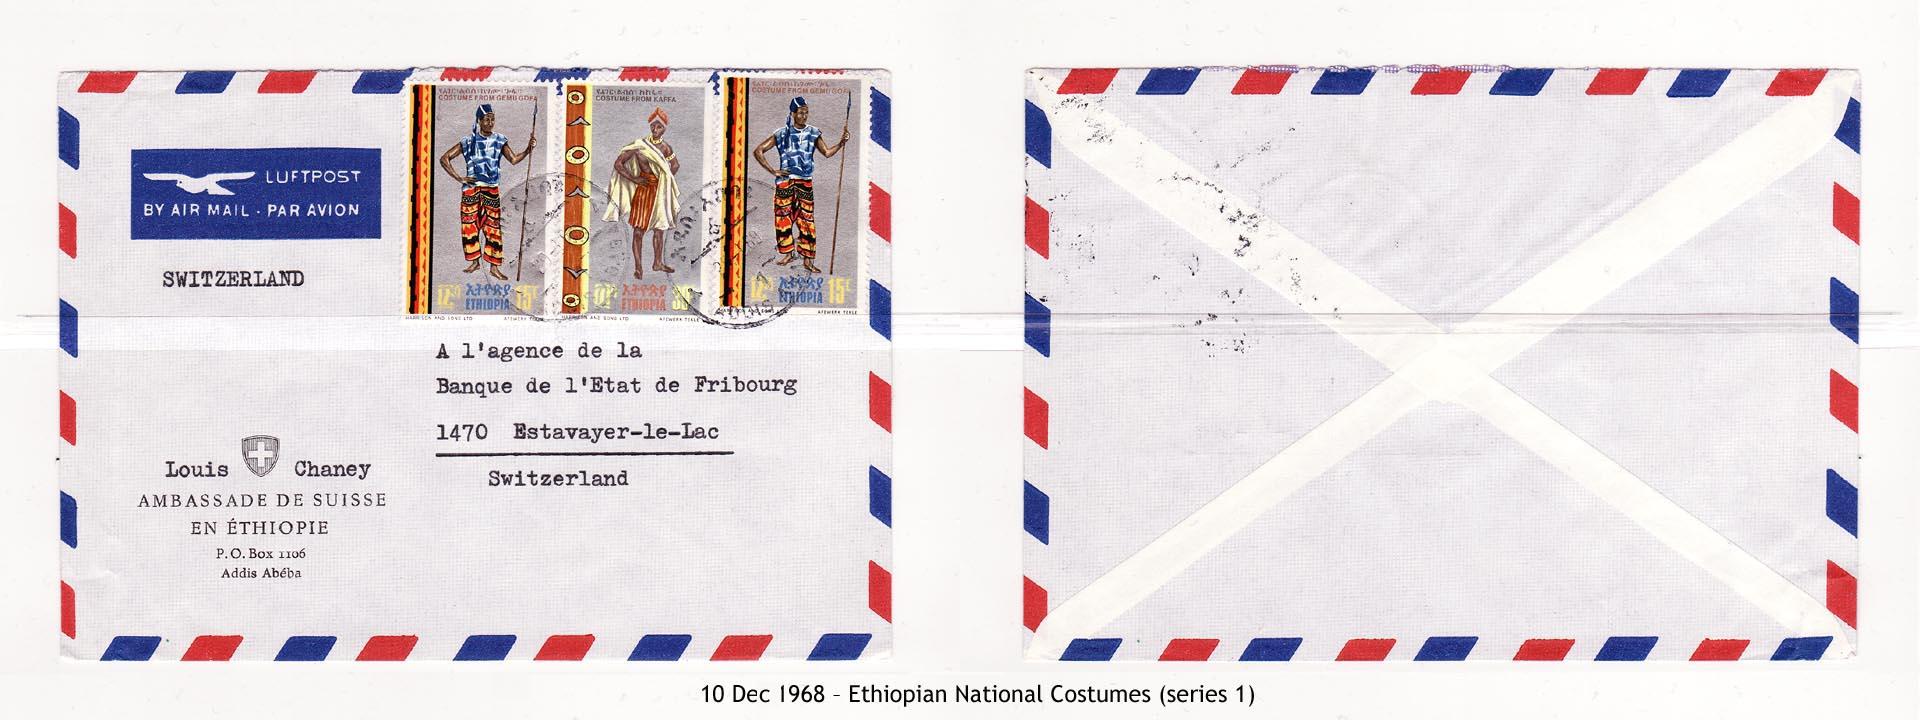 19681210 – Ethiopian National Costumes (series 1)